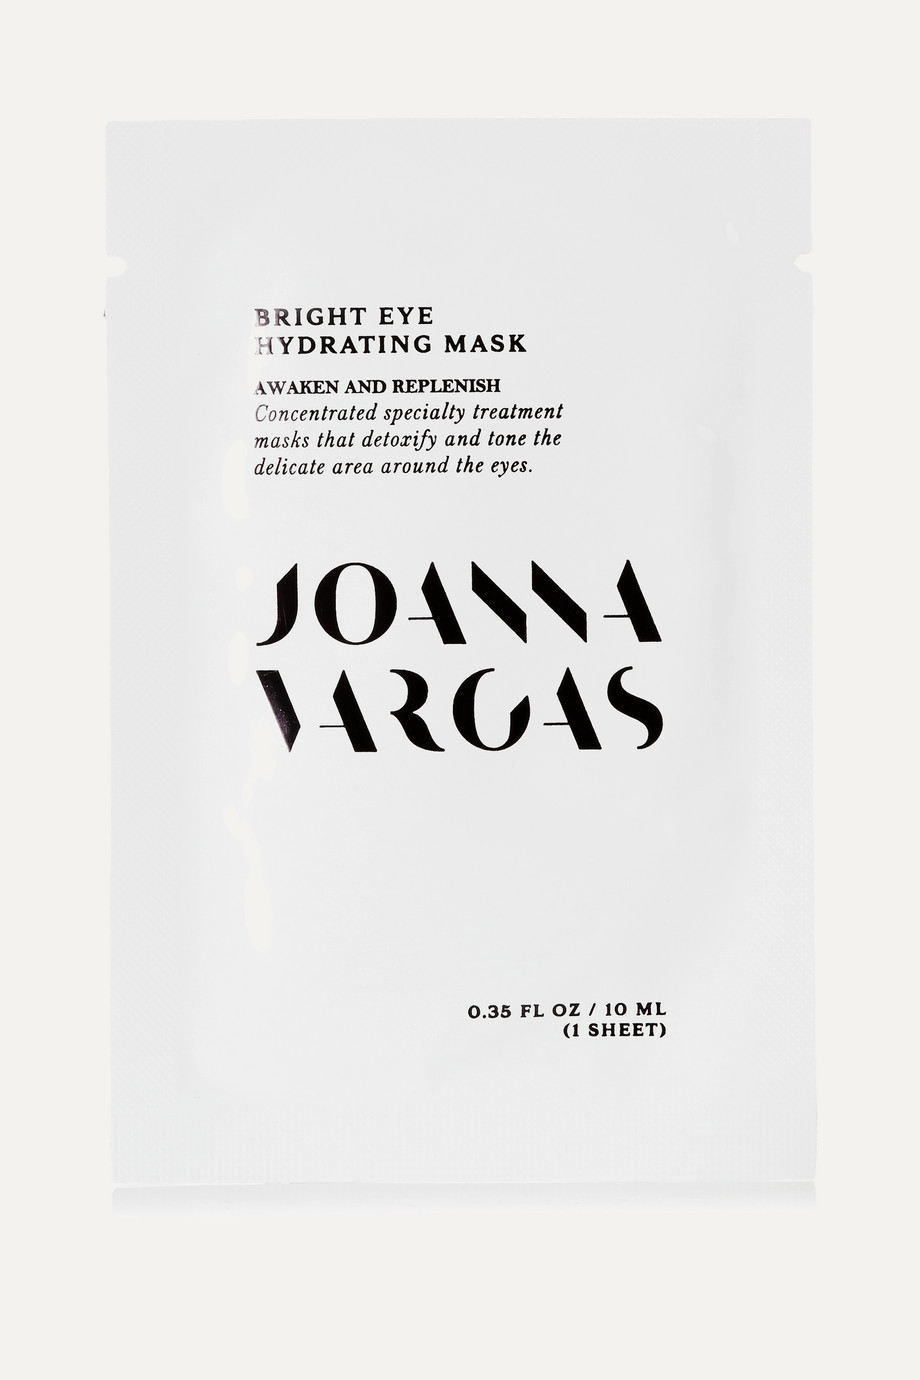 Joanna Vargas Bright Eye Hydrating Mask, 5 x 10ml